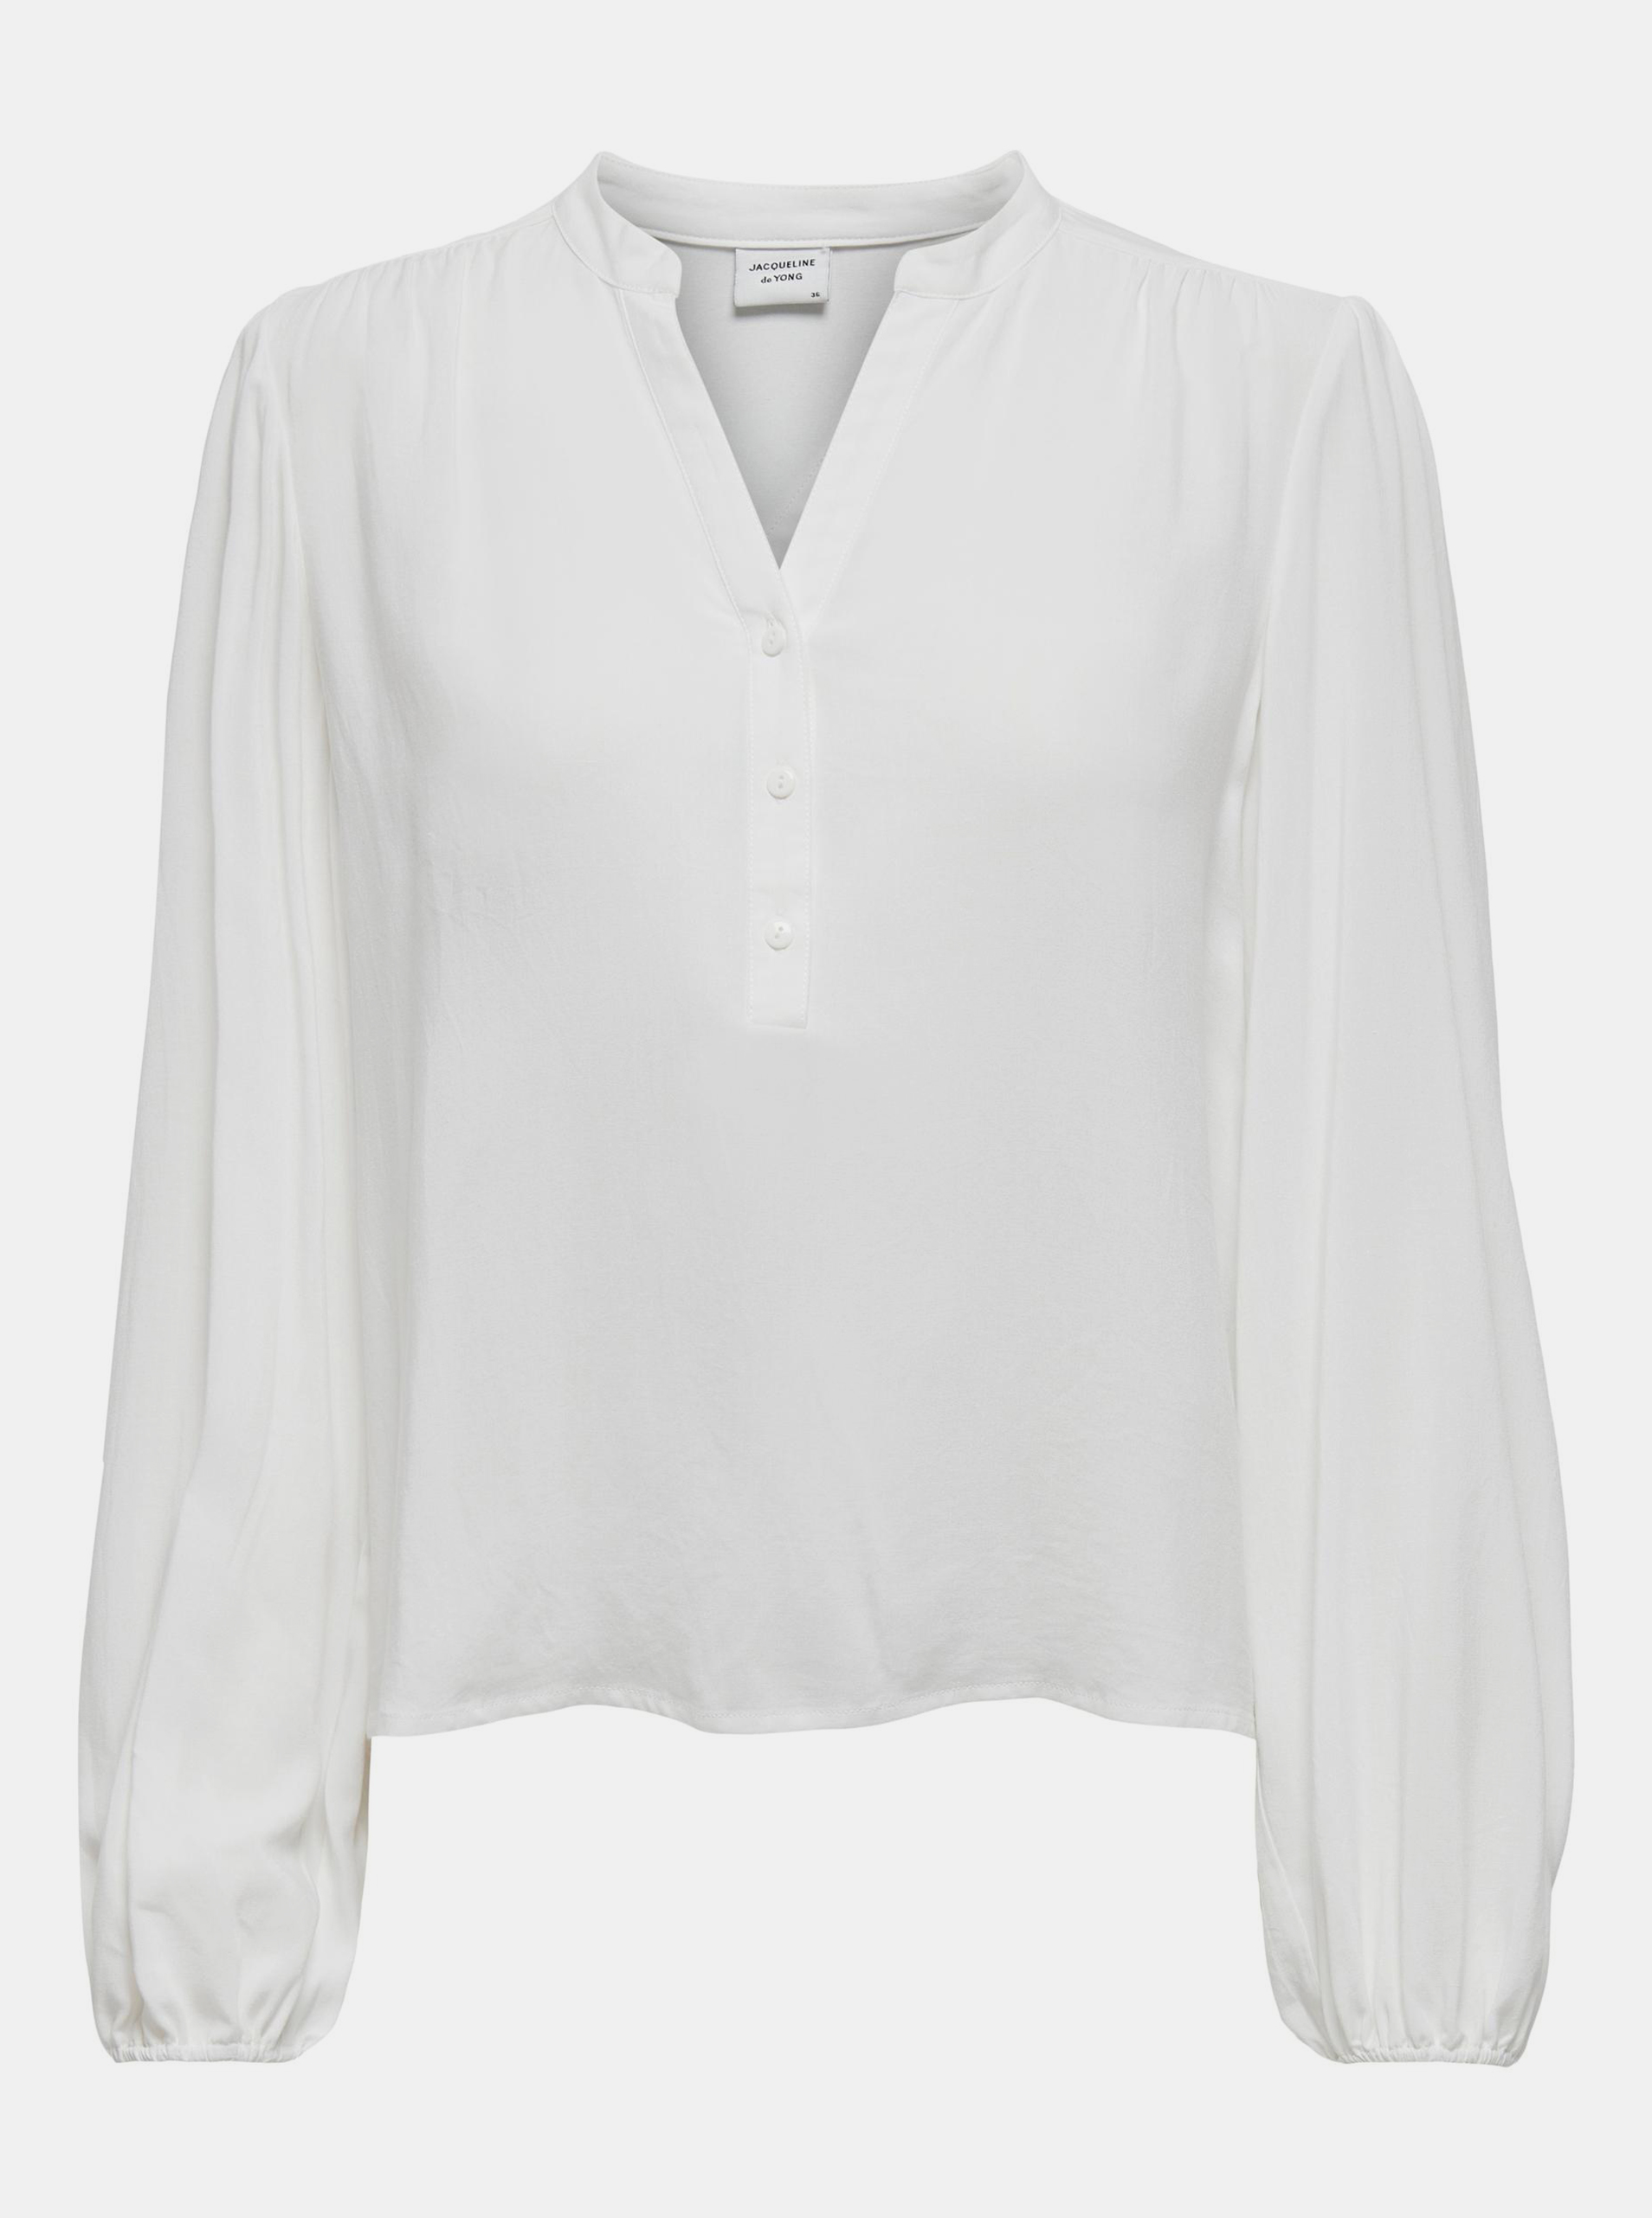 Jacqueline de Yong bianco camicetta Marlon